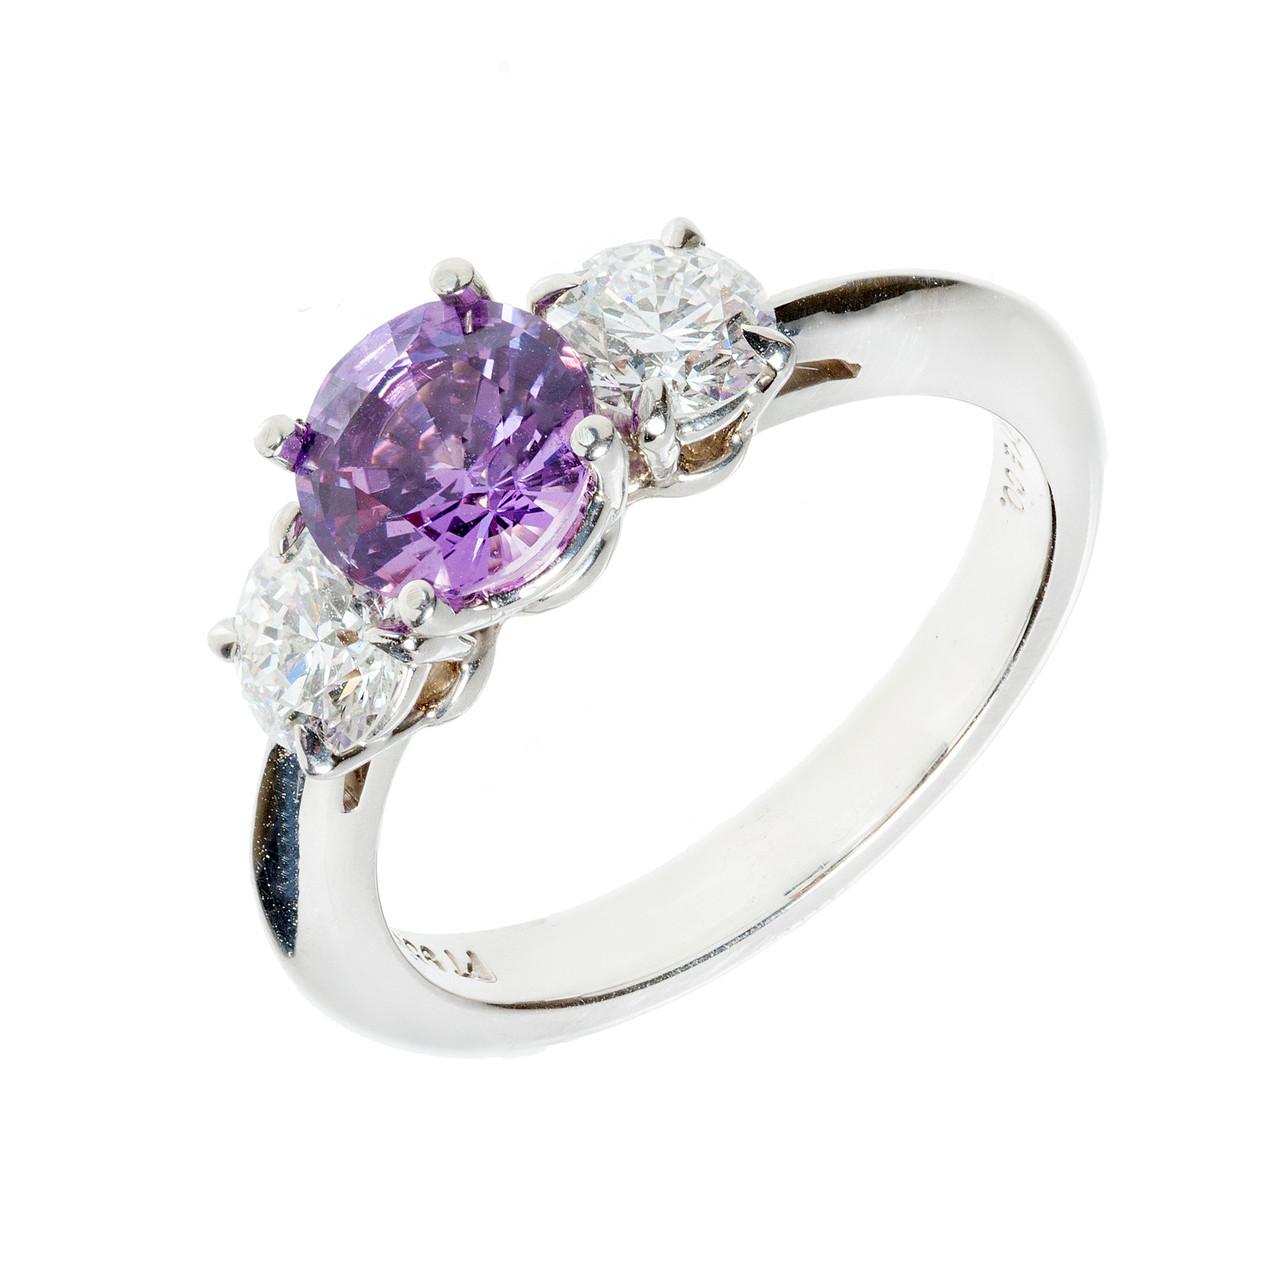 8ab18b8c4 Vintage Platinum Engagement Ring 1.22ct Sapphire .74ct Diamond Tiffany + Co  - petersuchyjewelers